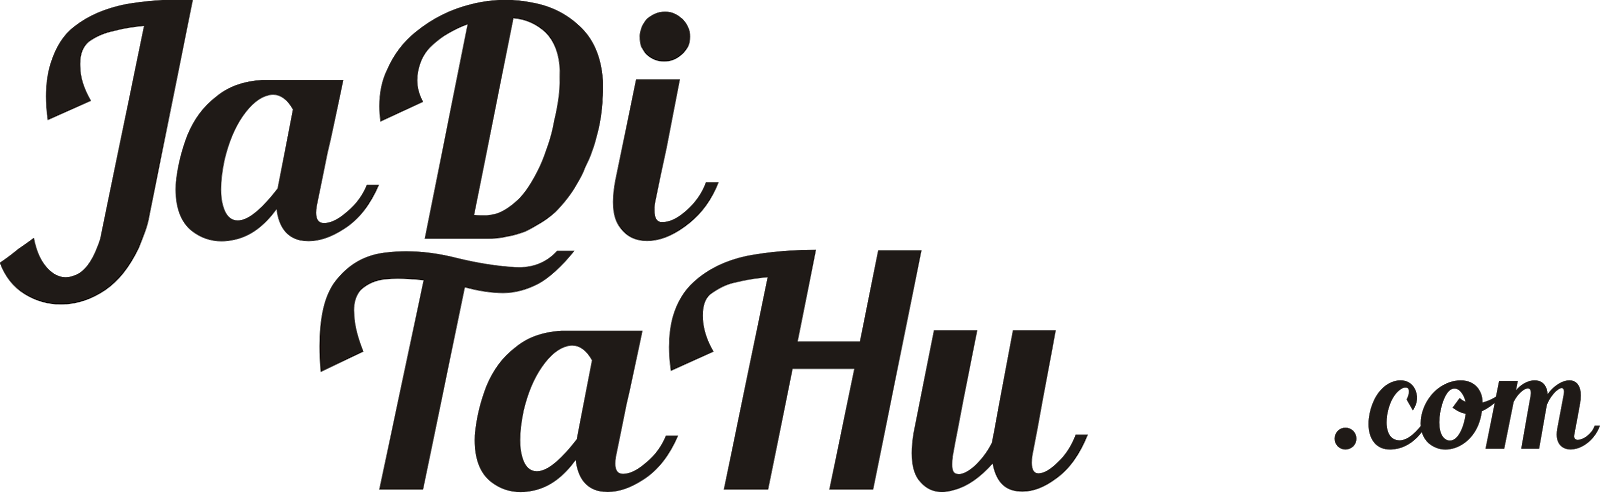 JadiTahu.com